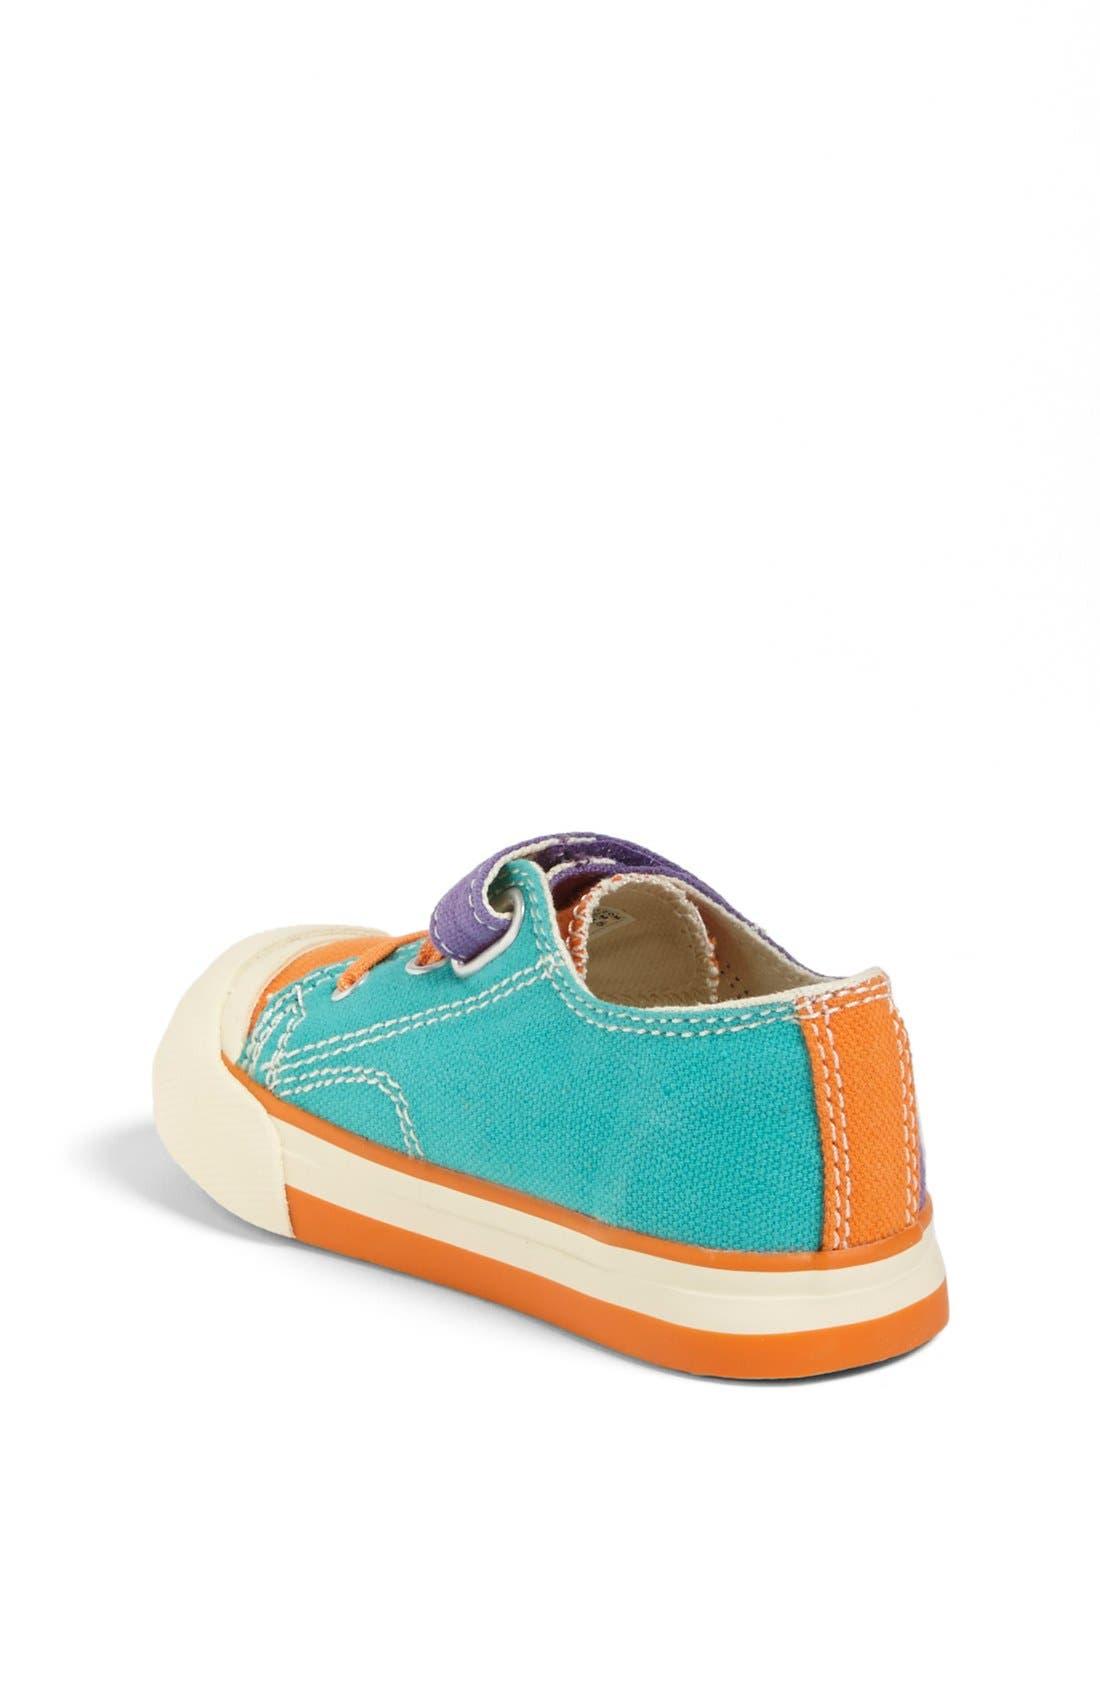 Alternate Image 2  - Keen 'Coronado' Sneaker (Baby & Walker)